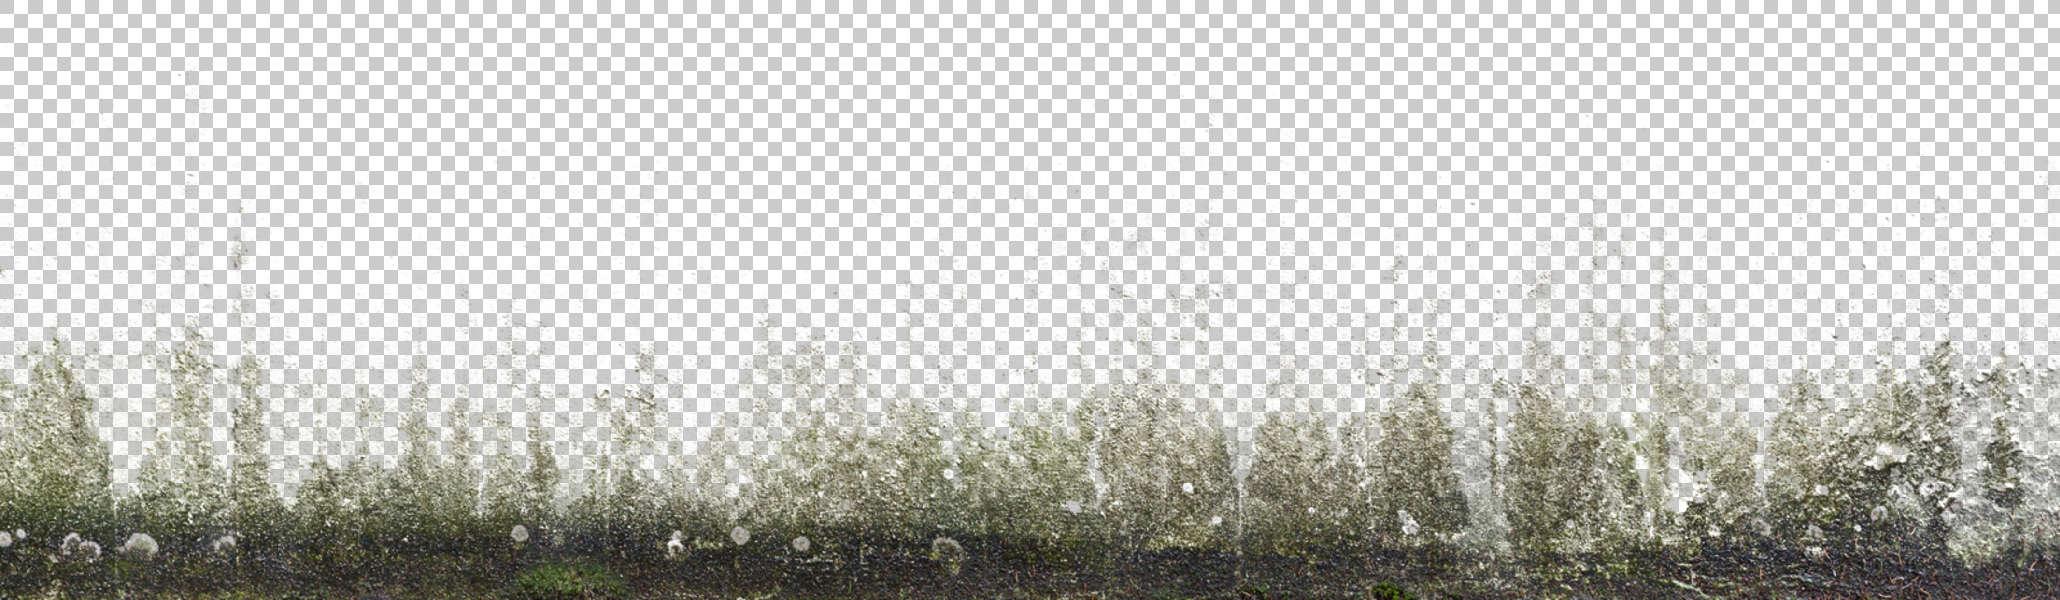 Decalbottom0008 Free Background Texture Decal Masked